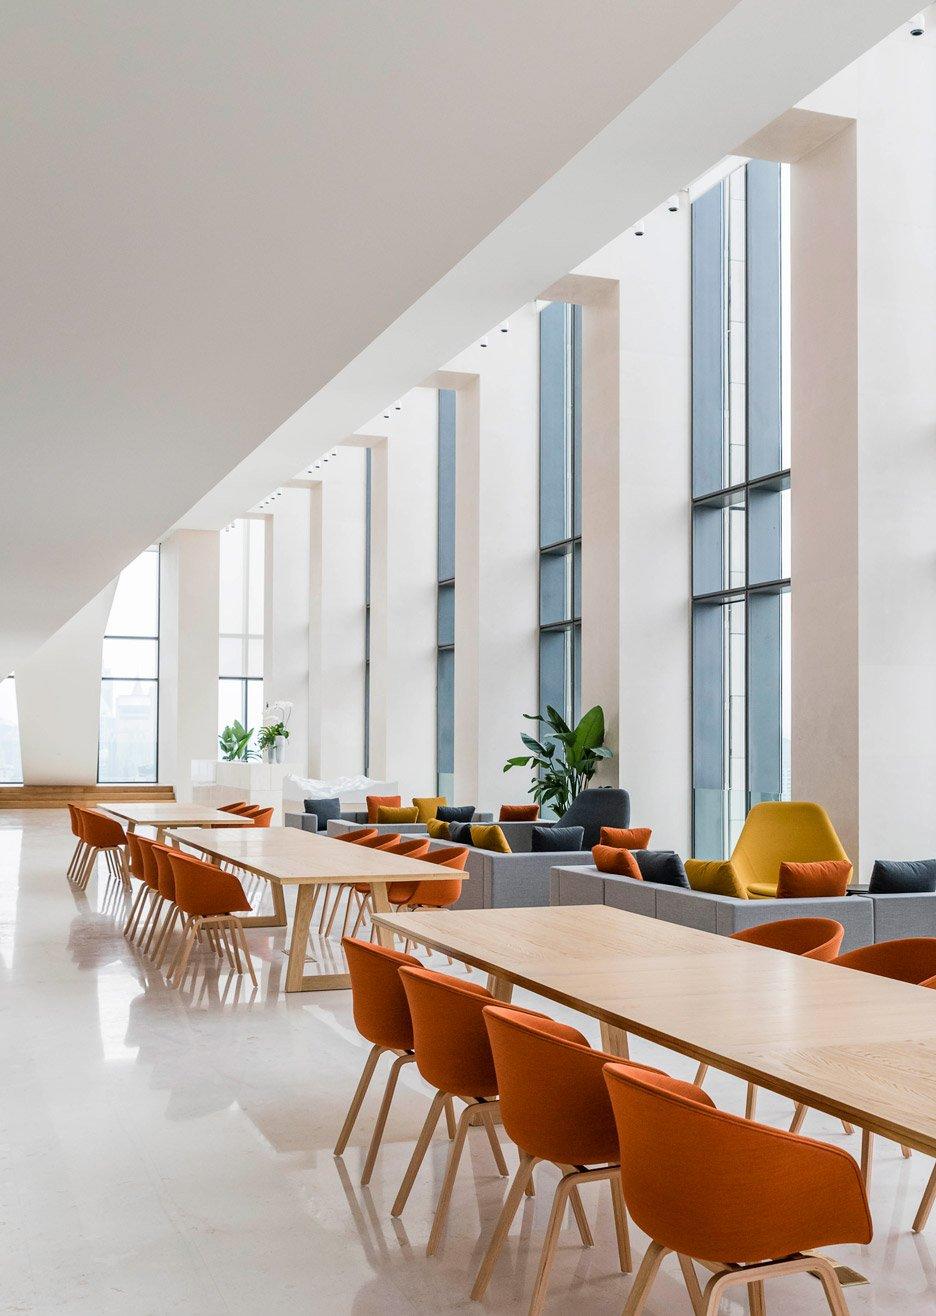 Aim Architecture designs timeless interior for Soho Bund in Shanghai